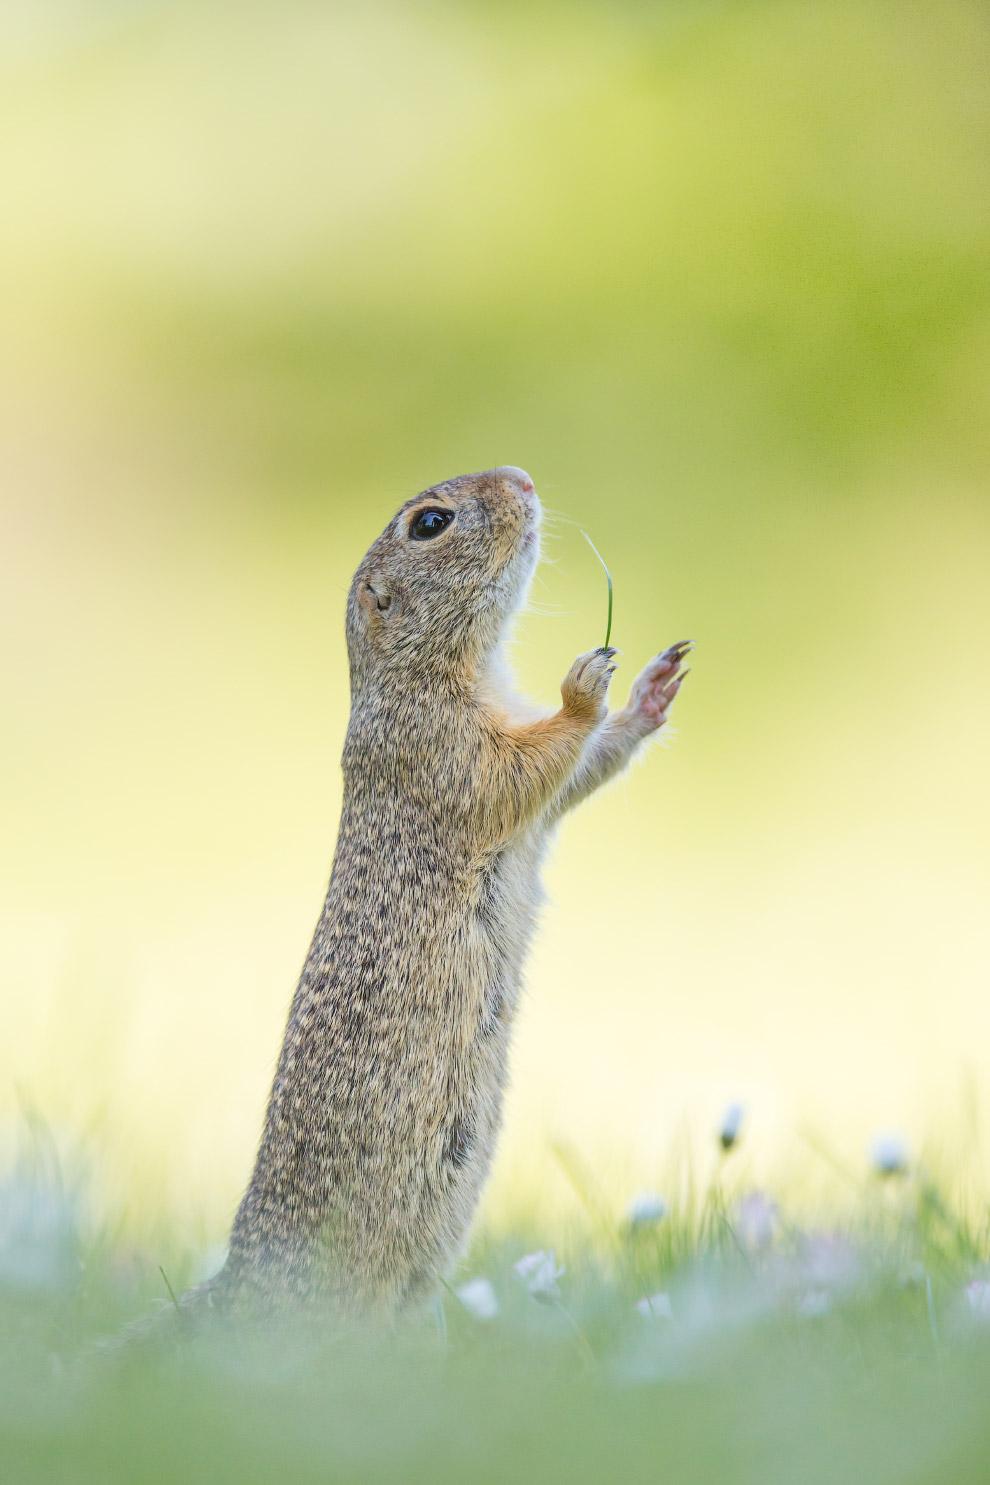 19. Пощечина. (Фото CWPA | Comedy Wildlife Photography Awards 2016):